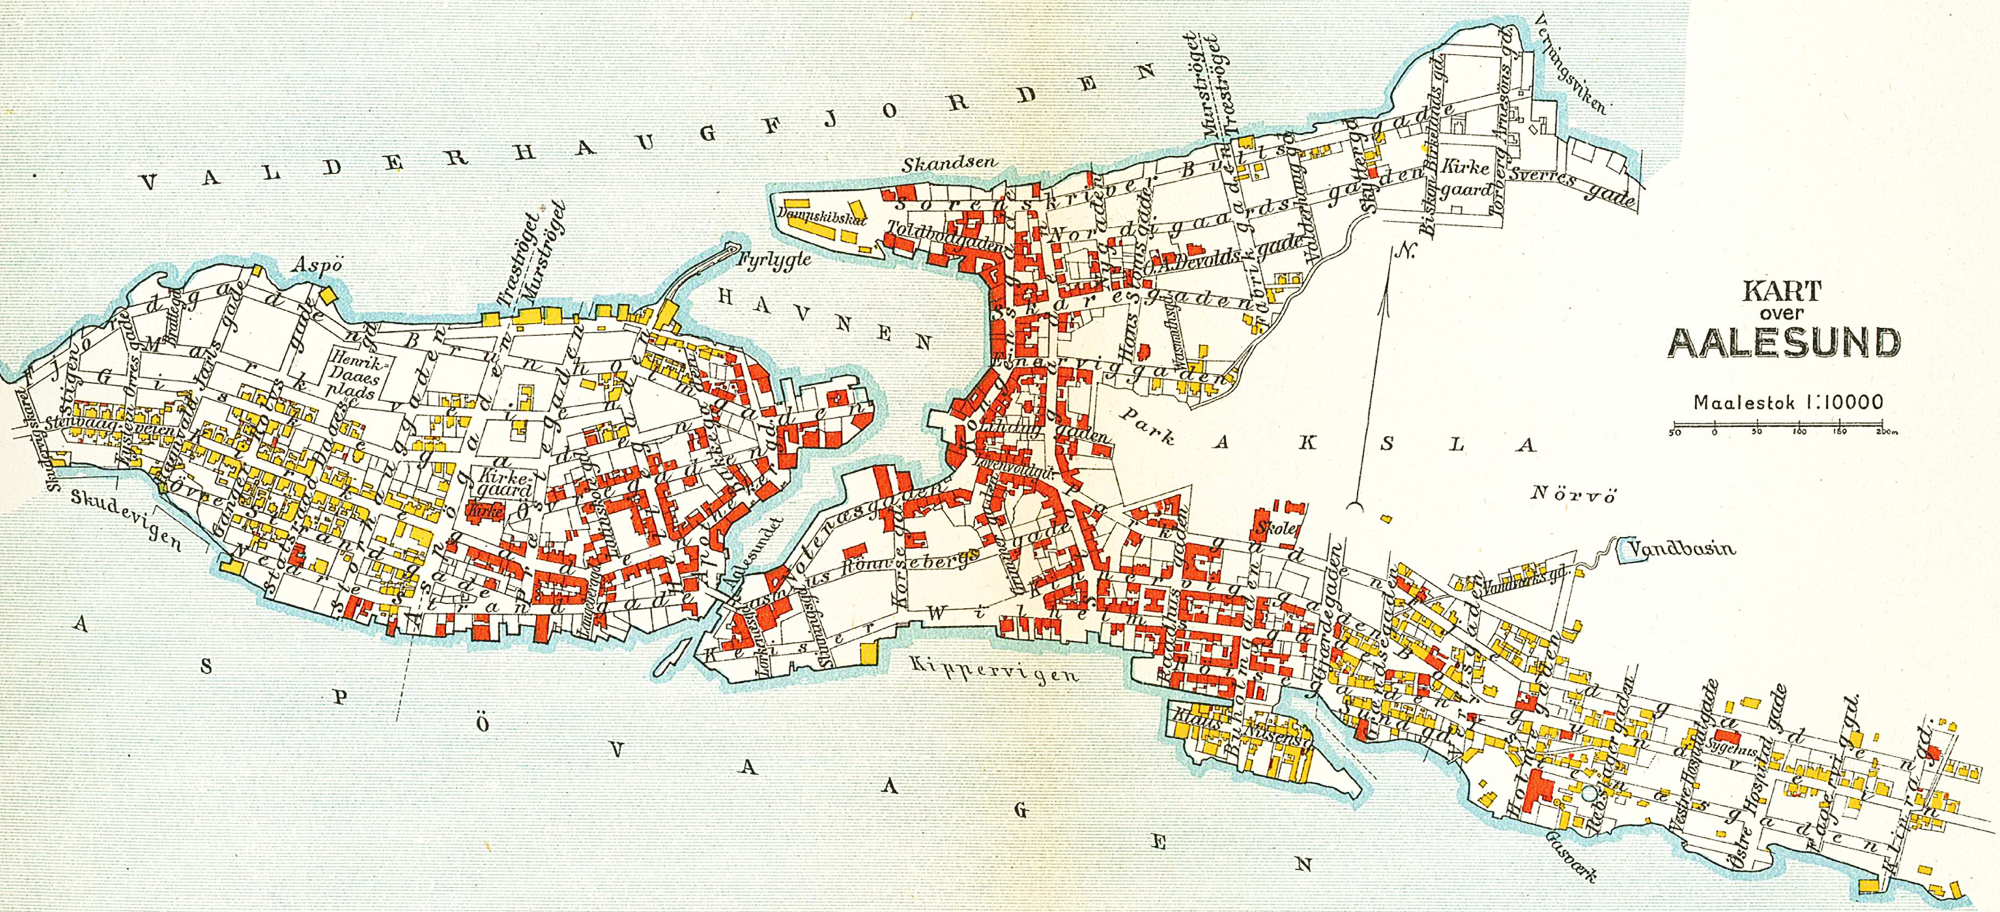 FileÅlesund Map Jpg Wikimedia Commons - Norway map alesund